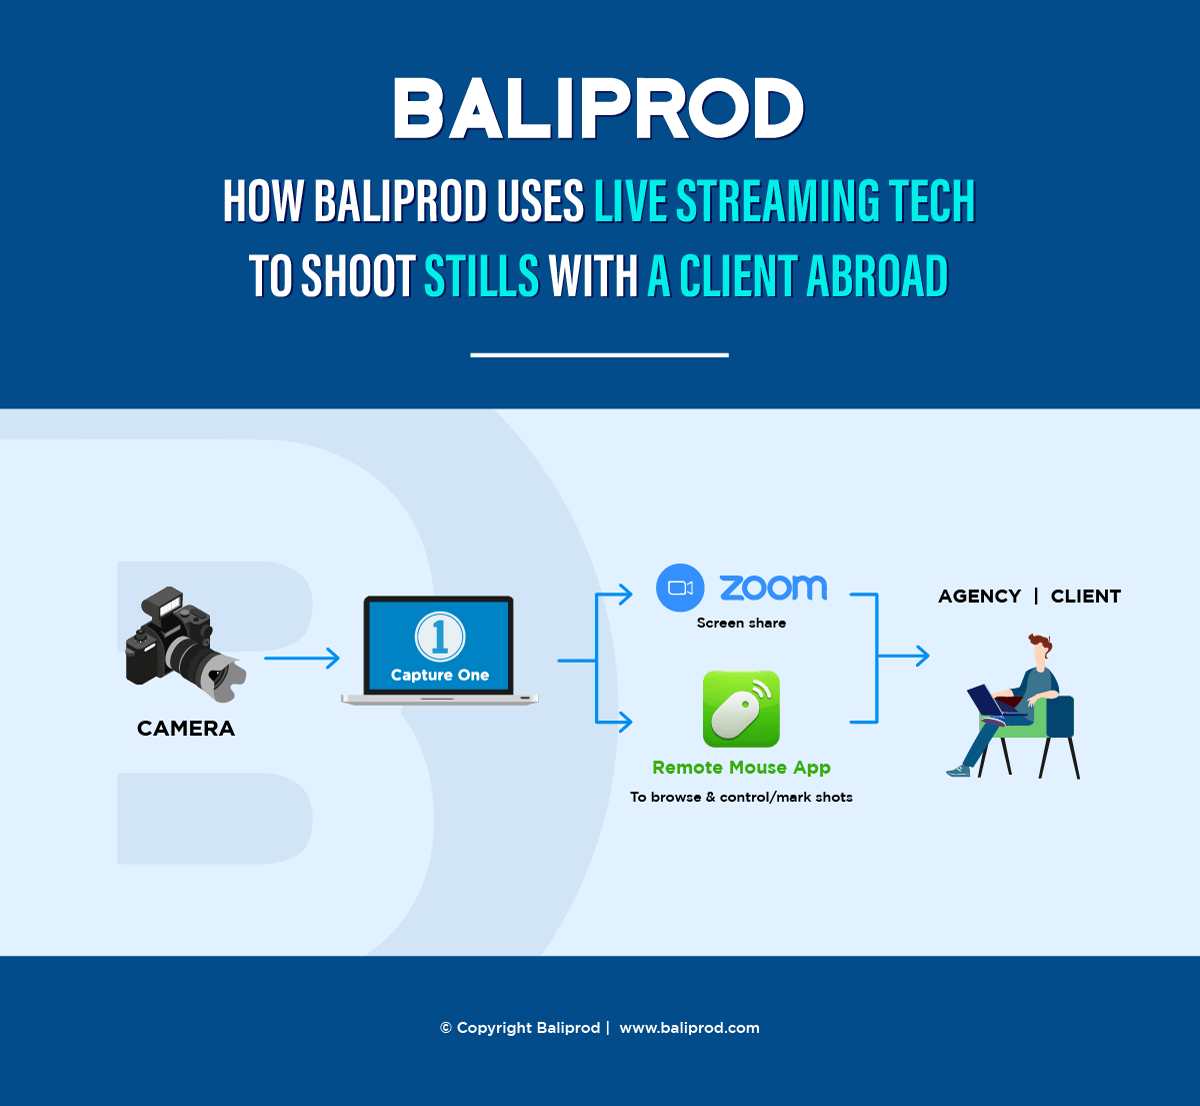 baliprod live streaming on shoot stills